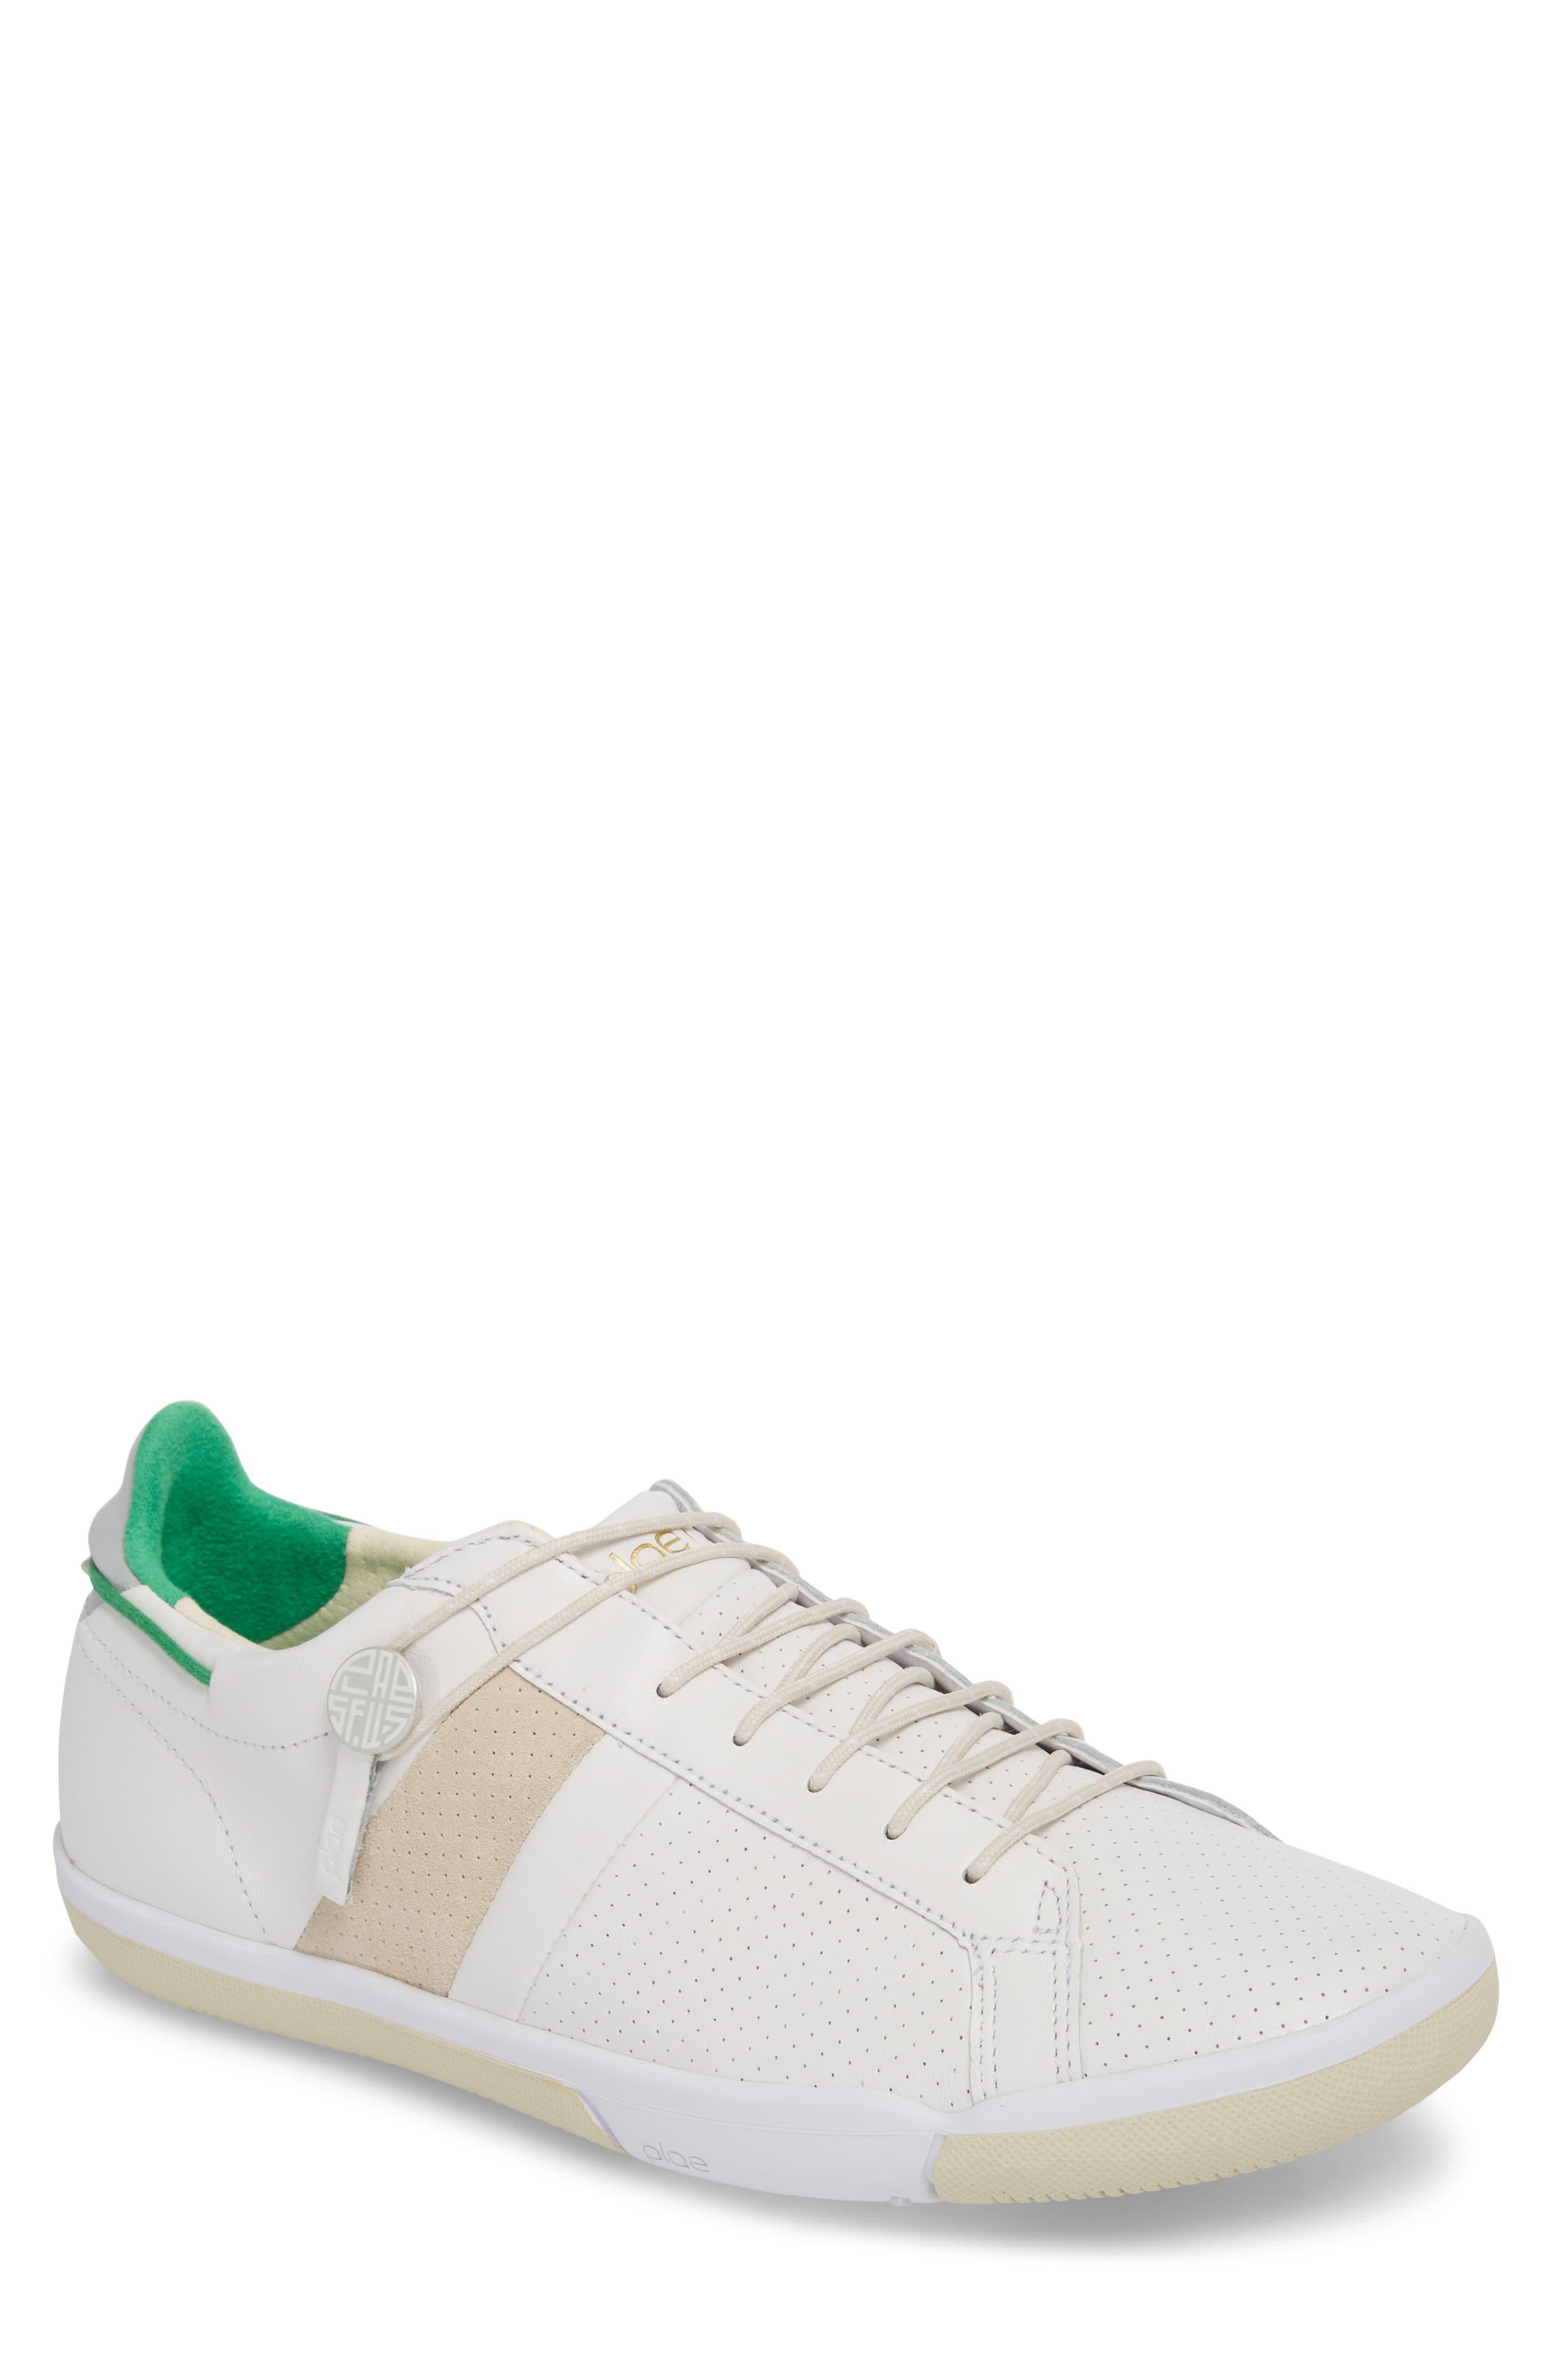 Main Image - PLAE Mulberry Low Top Sneaker (Men)